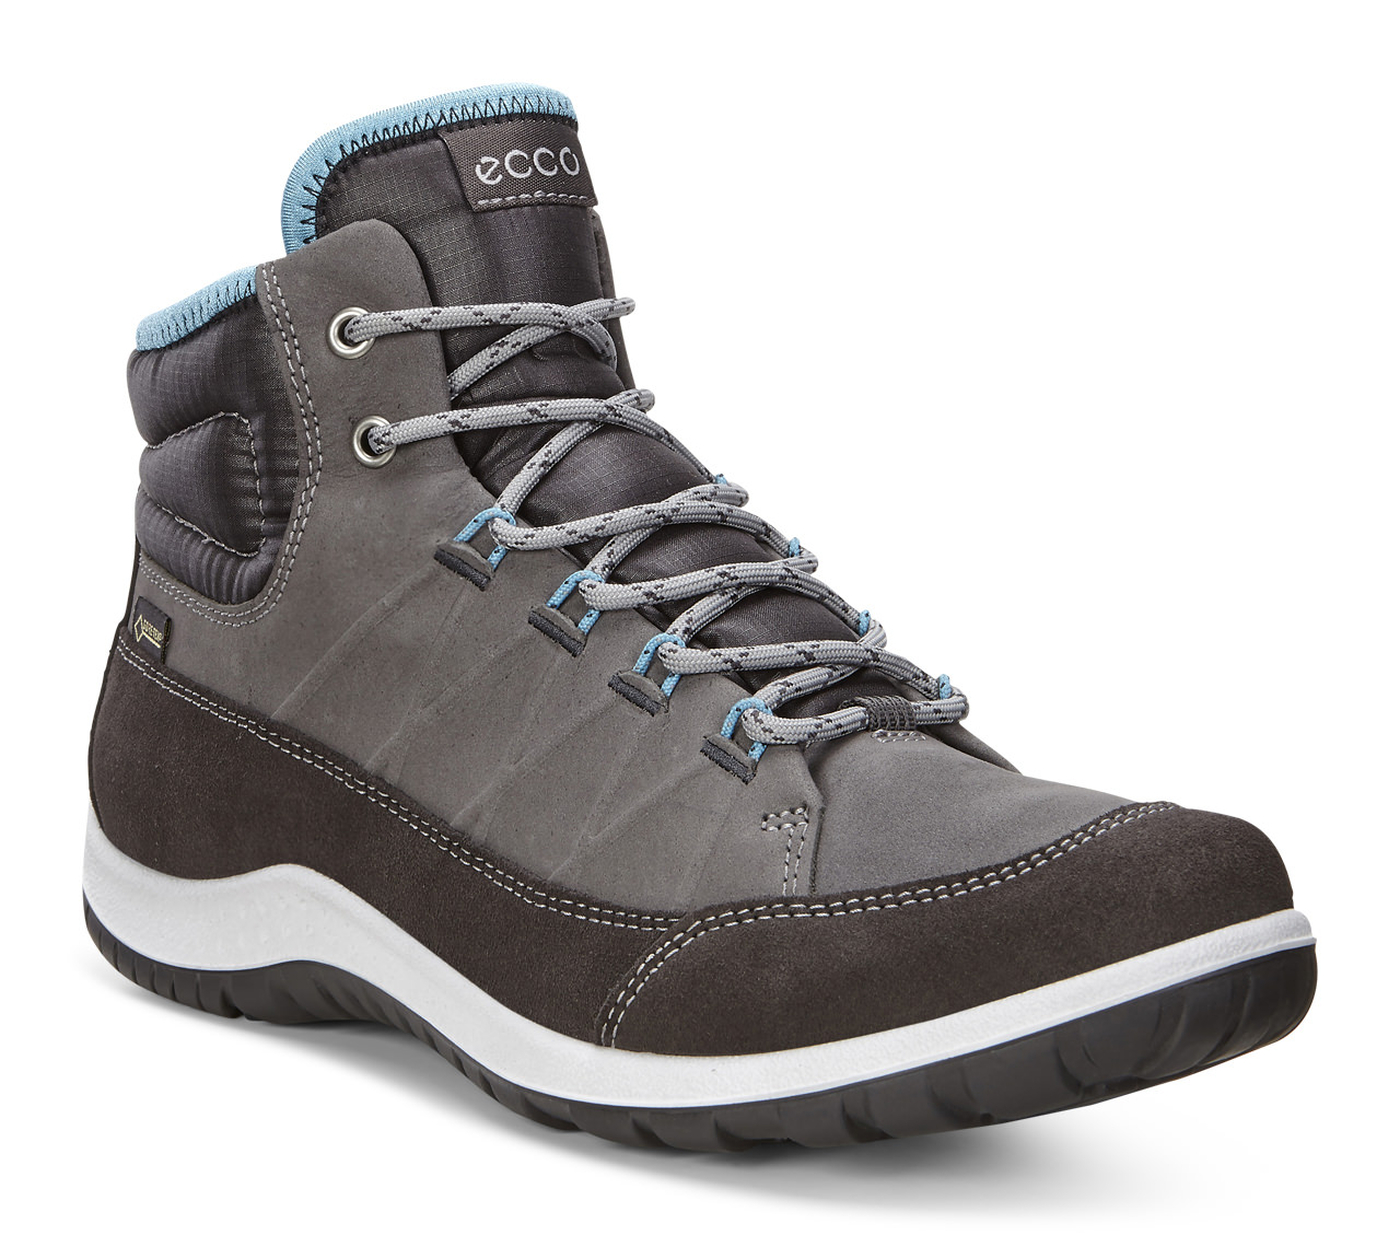 ECCO Women's Aspina GTX High | Hiking Boots | ECCO® Shoes